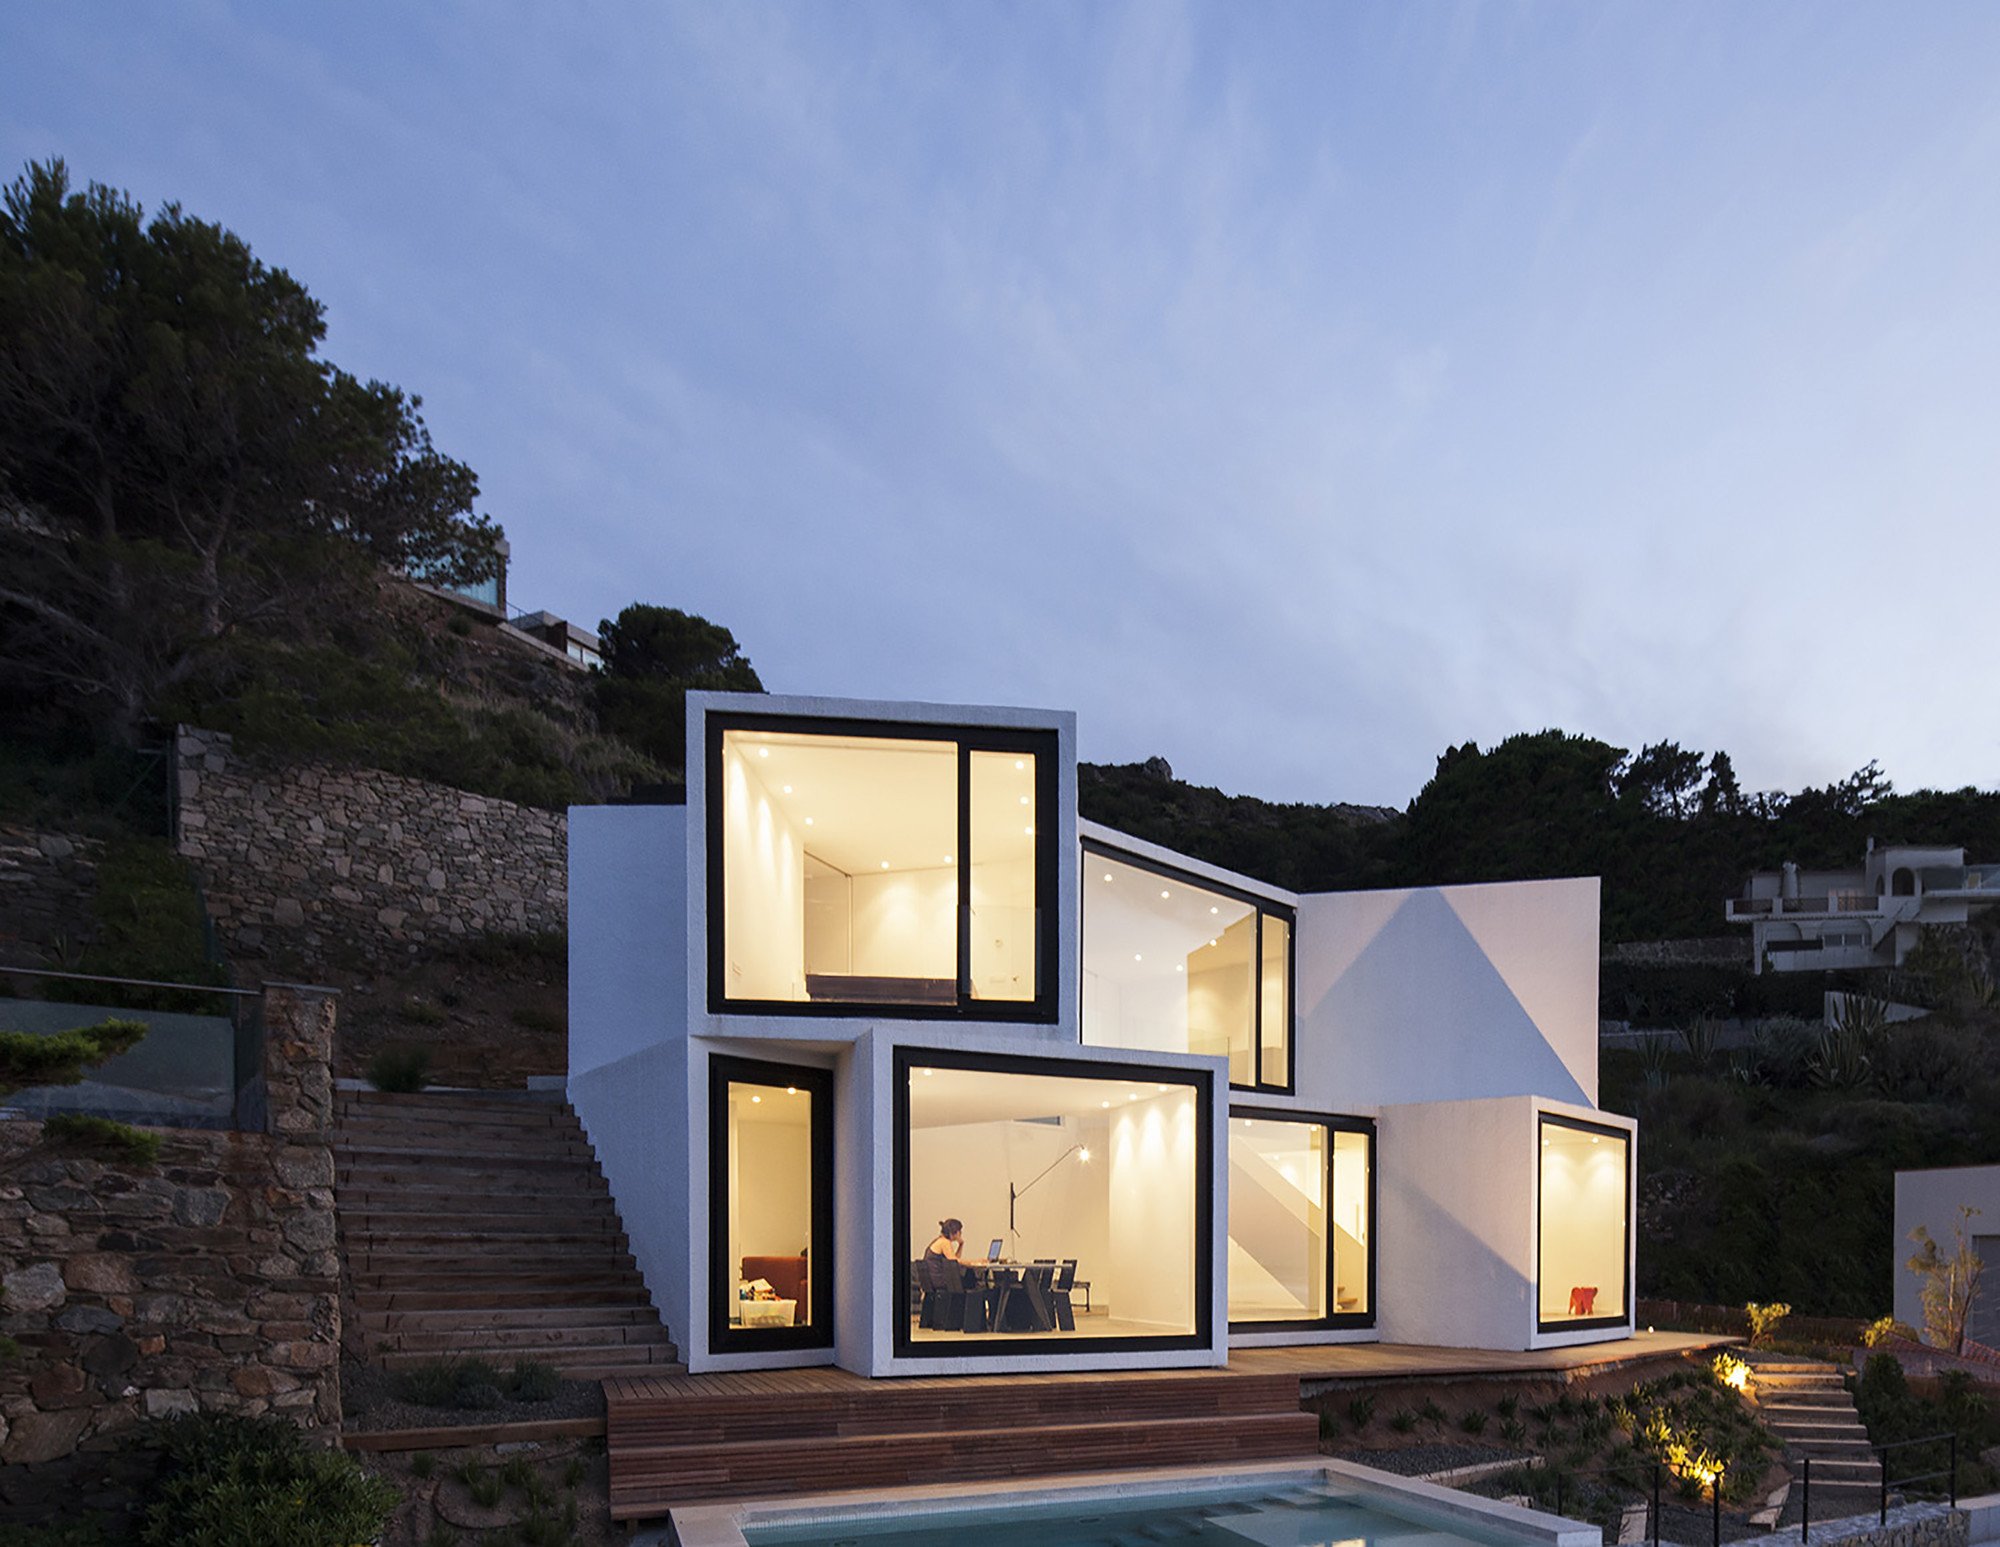 Casa Girasol  / Cadaval & Solà-Morales, © Sandra Pereznieto